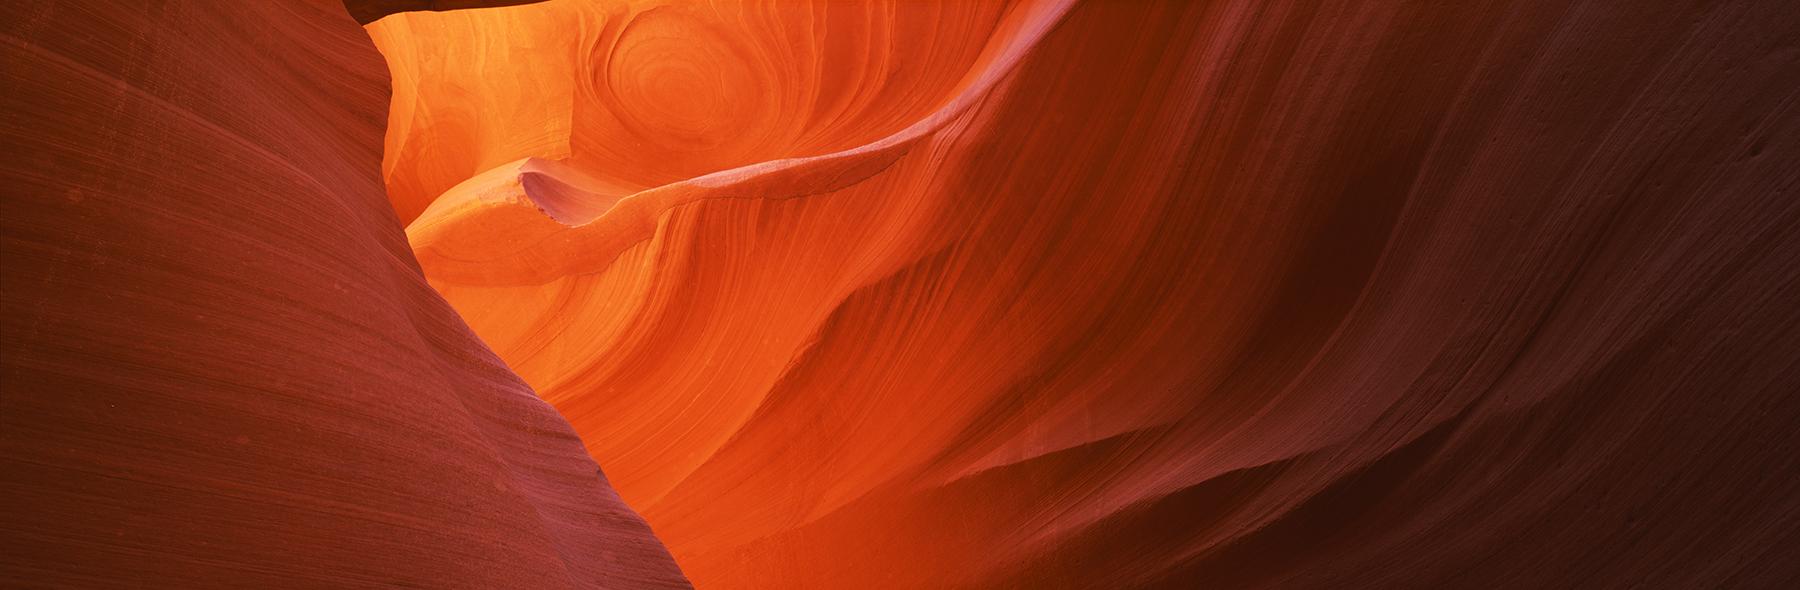 Antelope Canyon, Arizona, USA. A Limited Edition Fine Art Landscape Photograph by Richard Hume